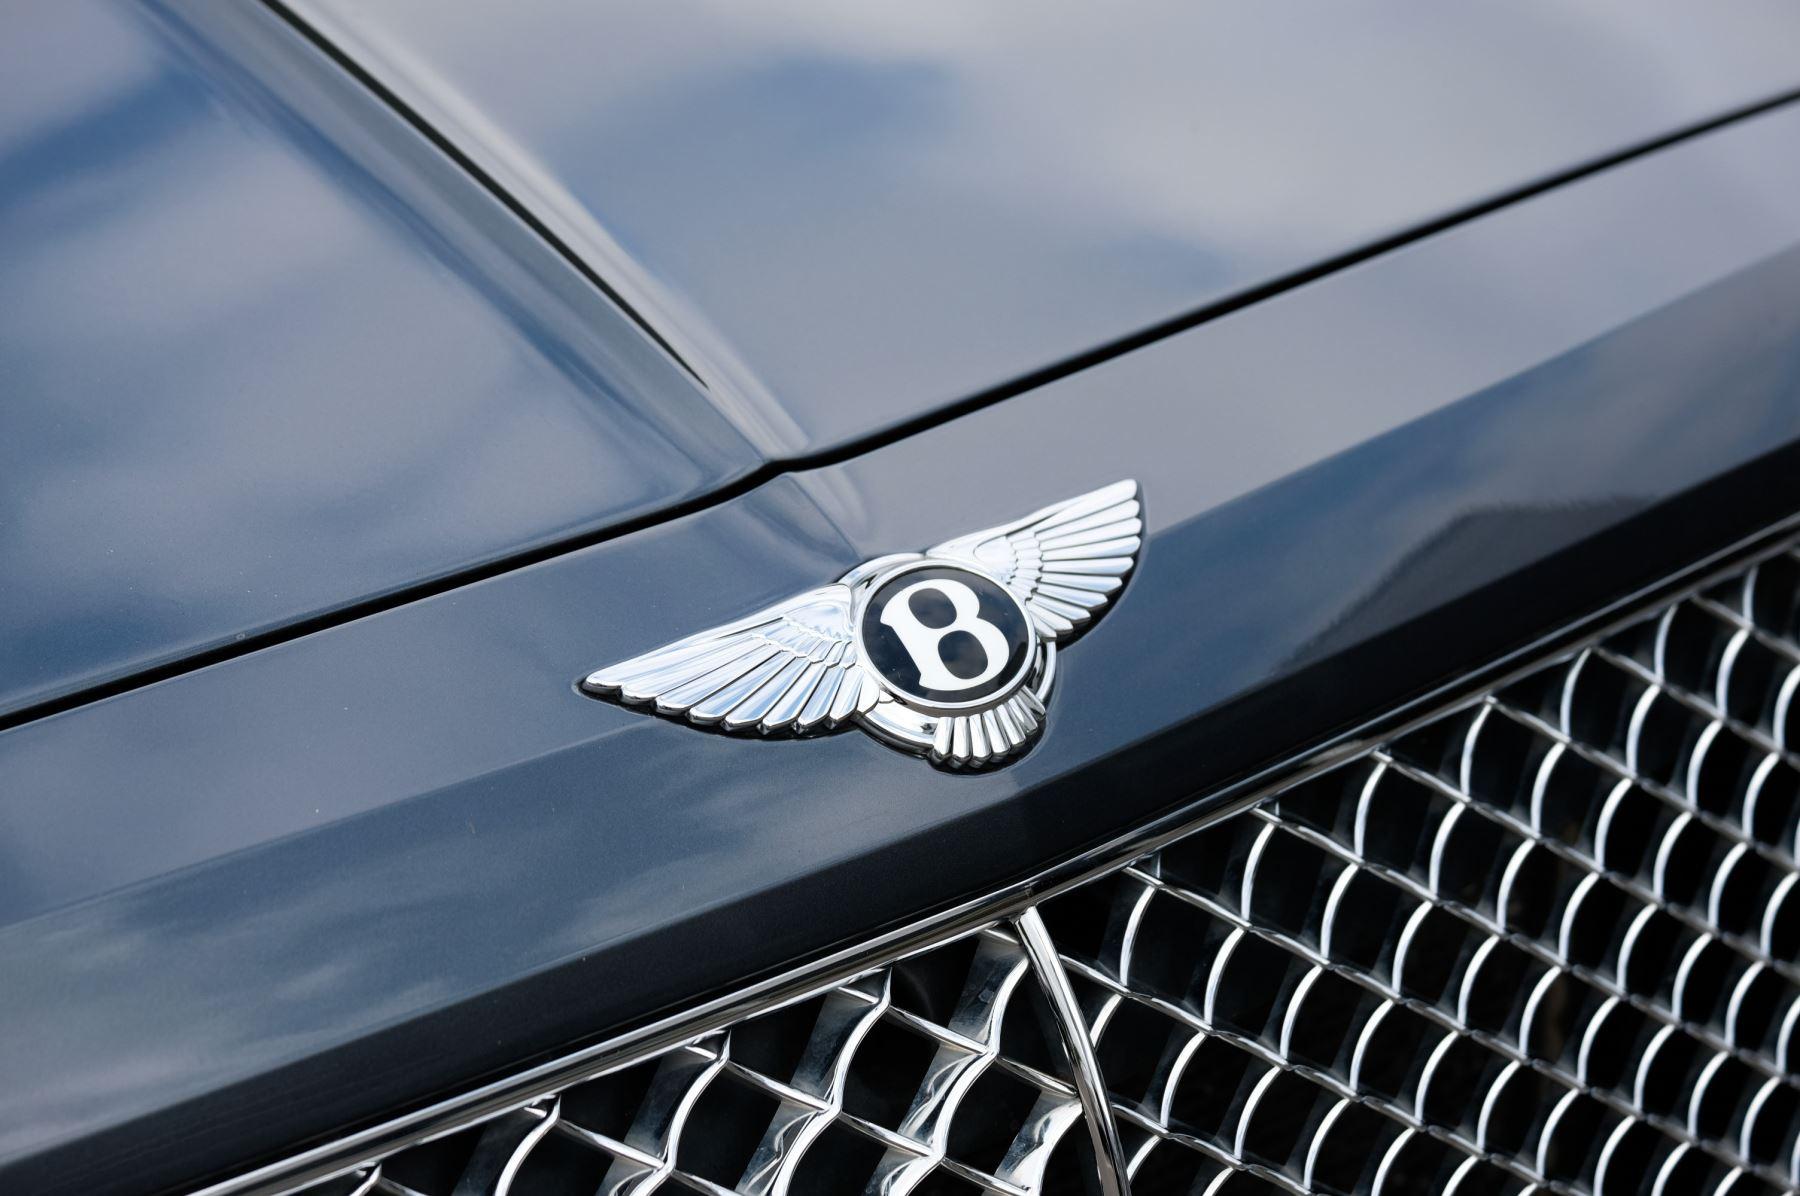 Bentley Bentayga 4.0 V8 5dr - Mulliner Driving Specification - City & Tour Specification image 7